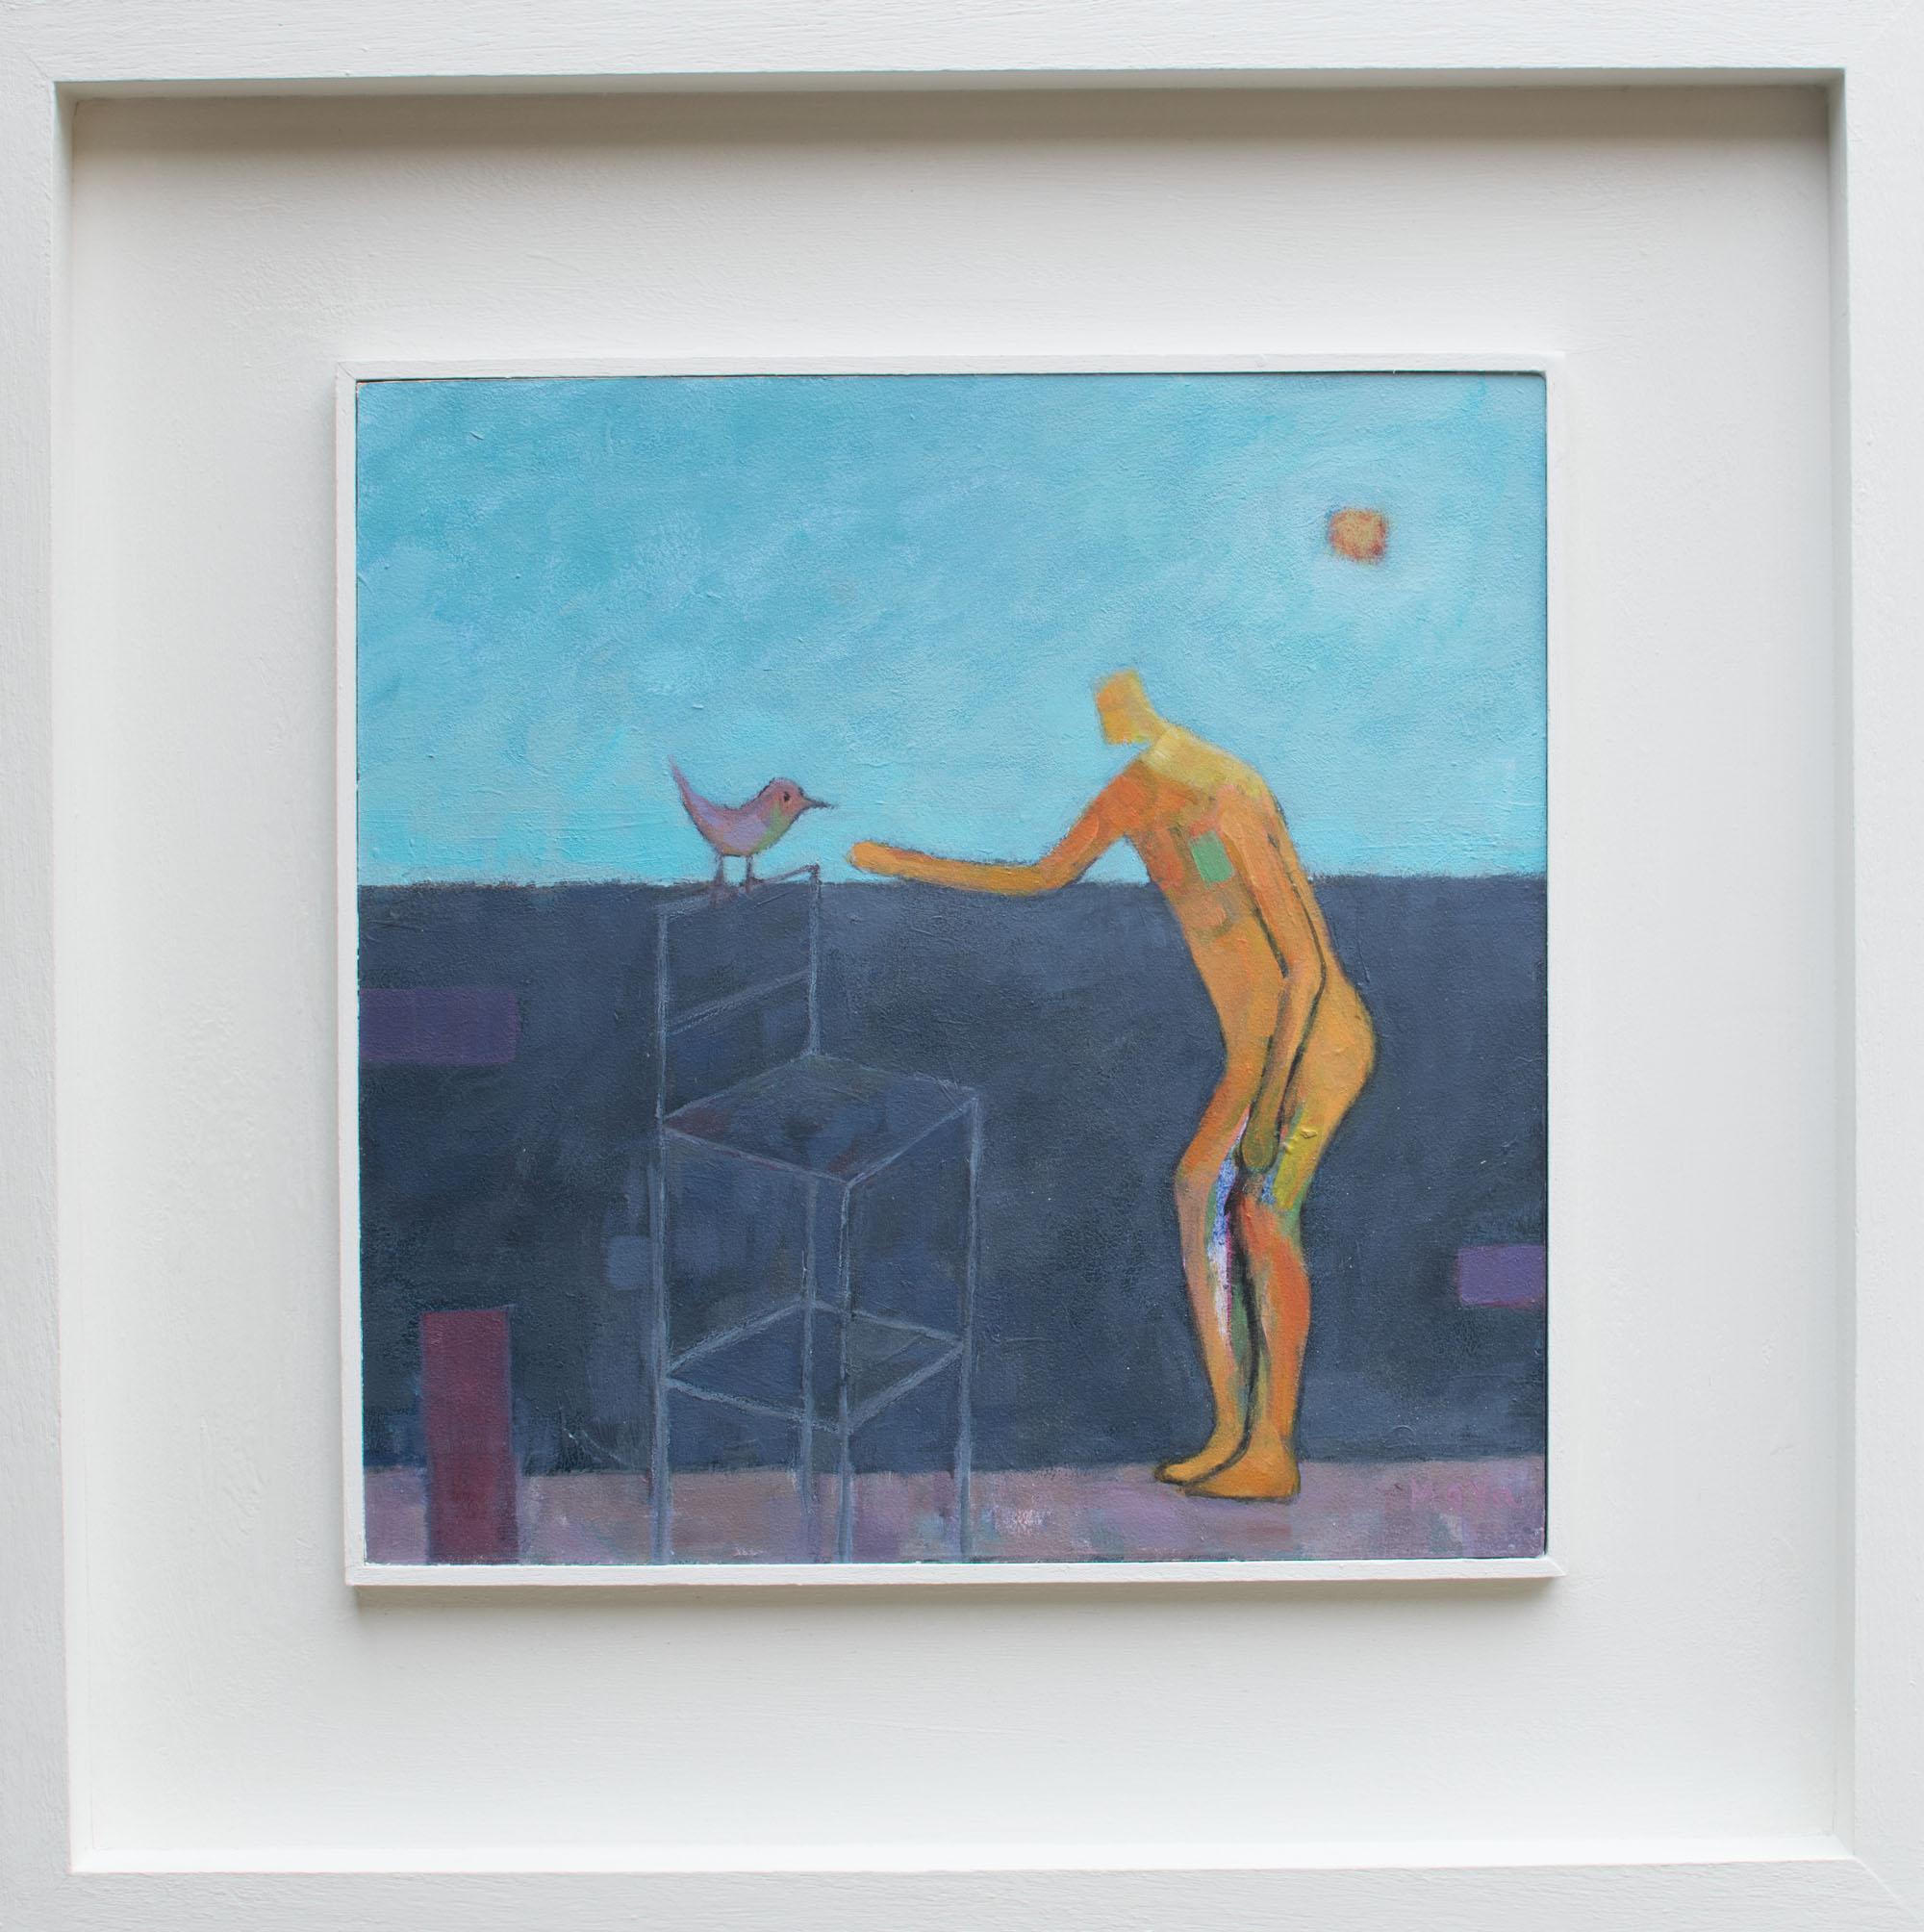 Man Meets Bird  acrylic on board  49 x 49 cm framed  SOLD